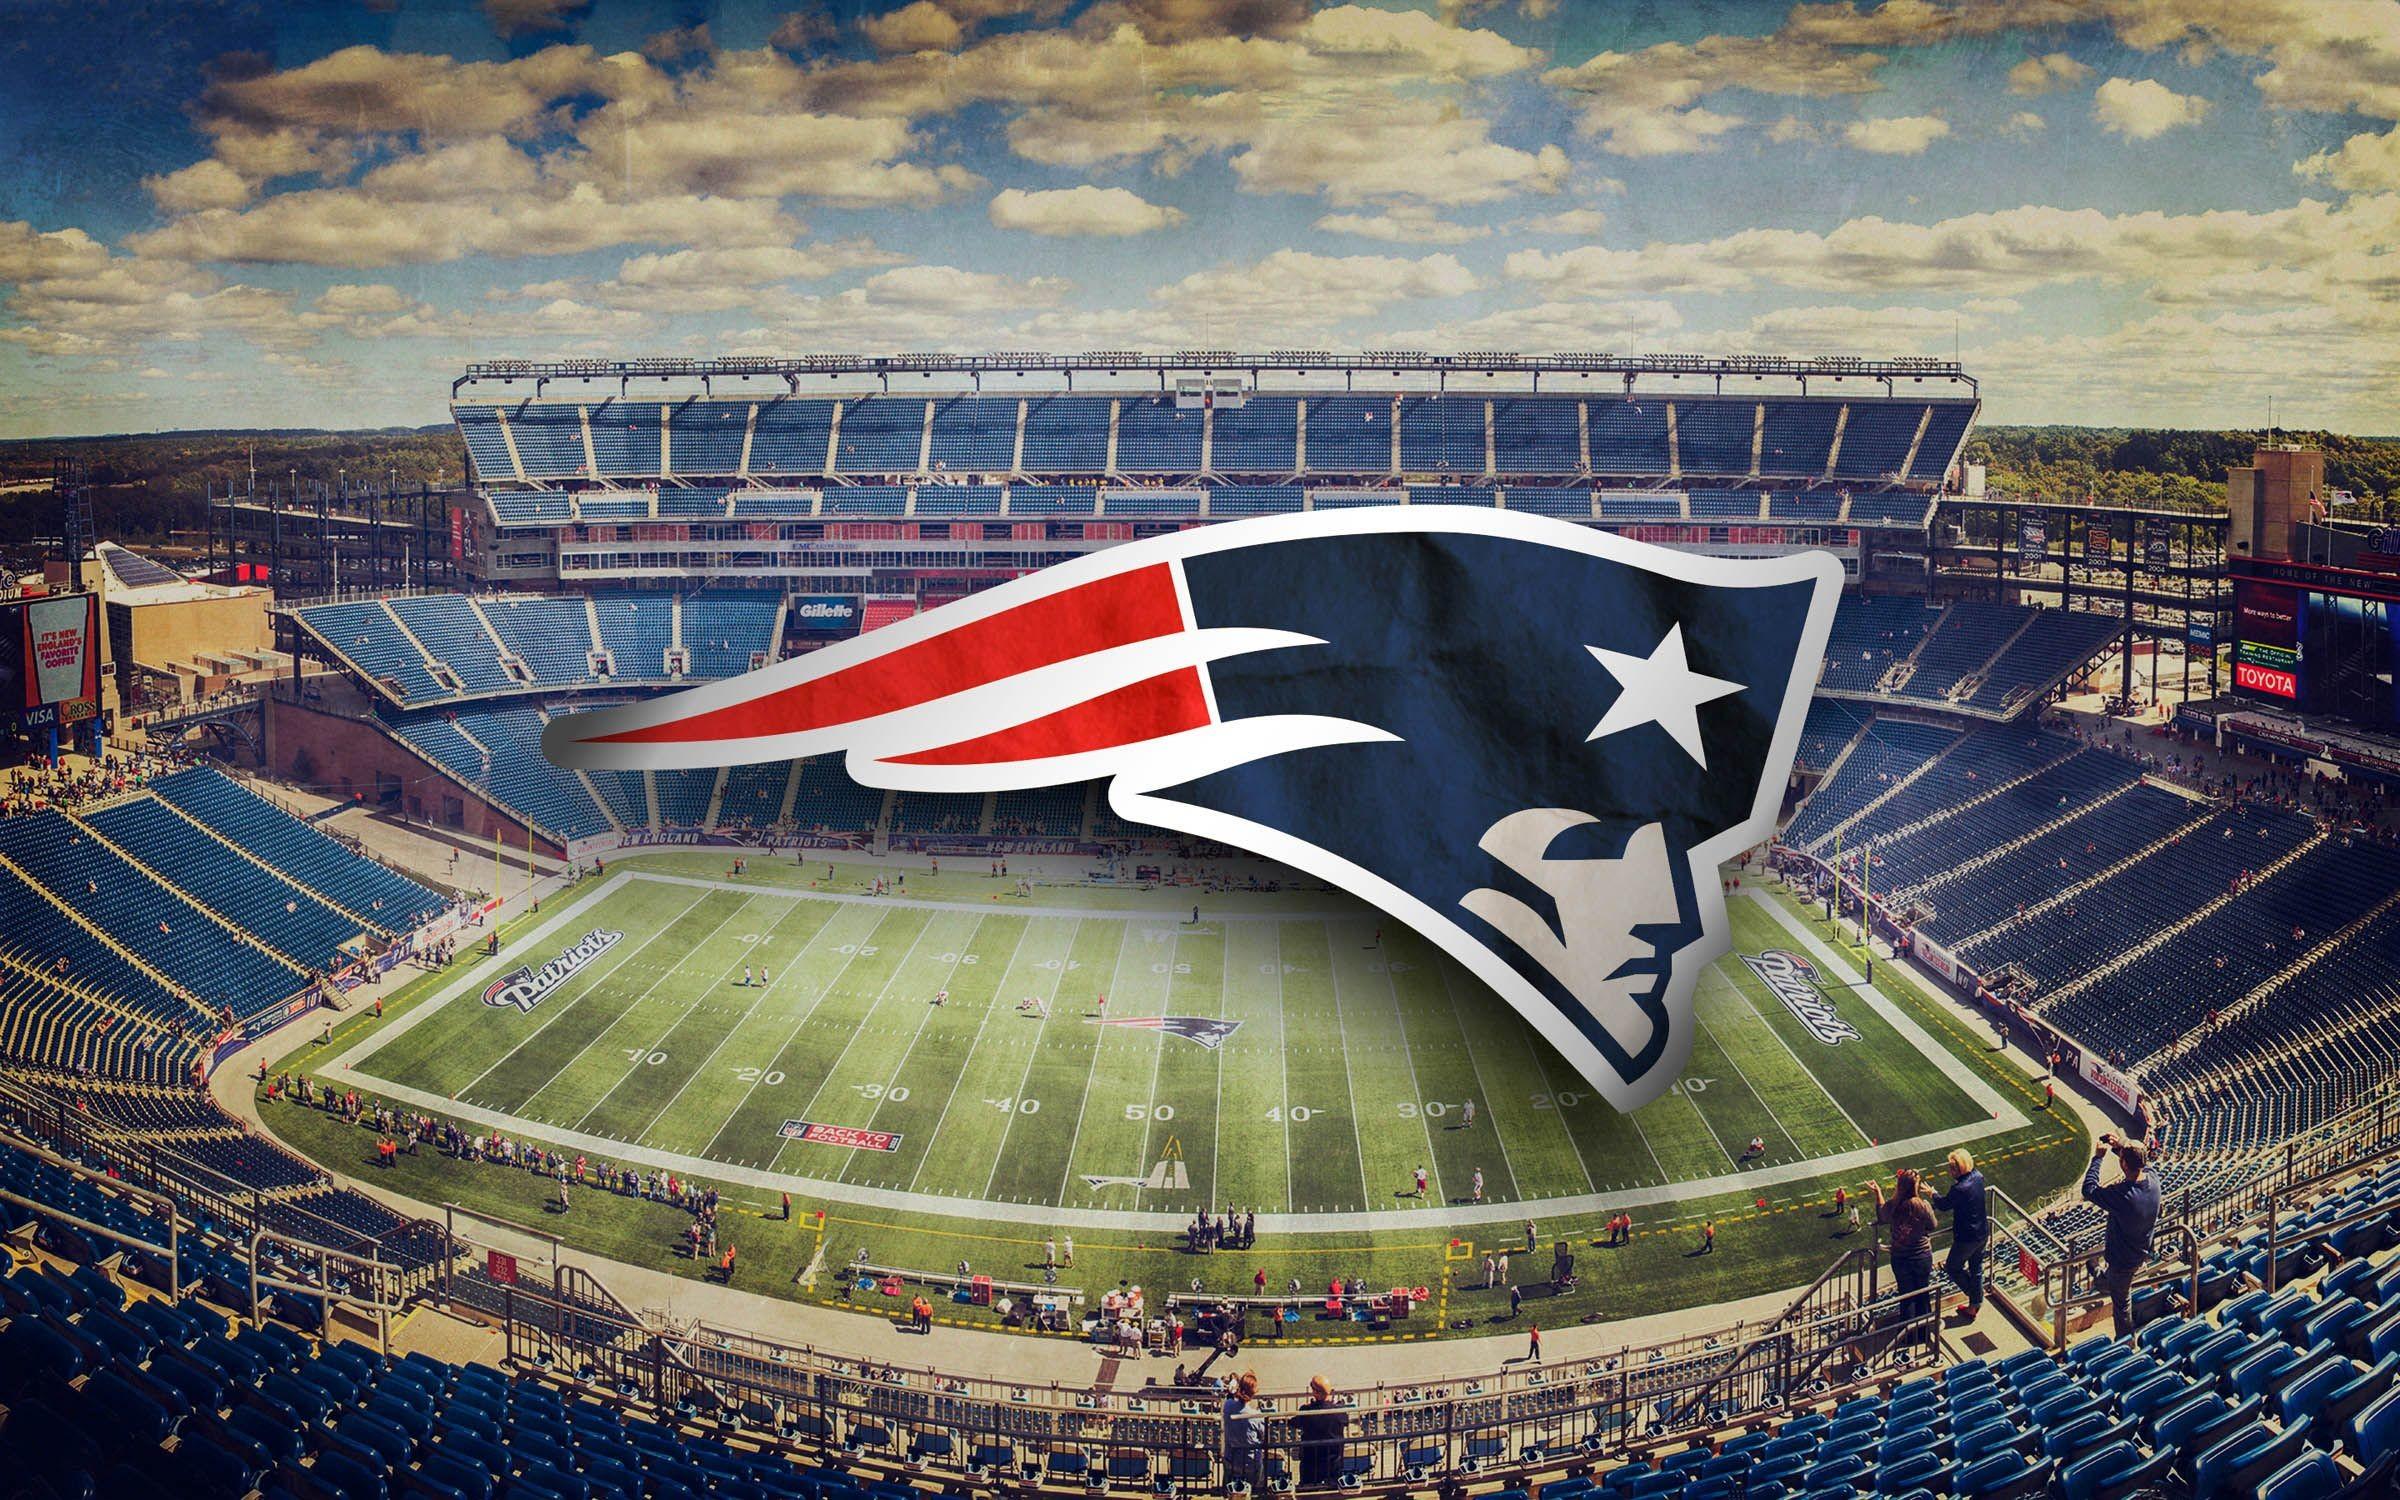 New England Patriots Wallpaper – Logo and Stadium Photo